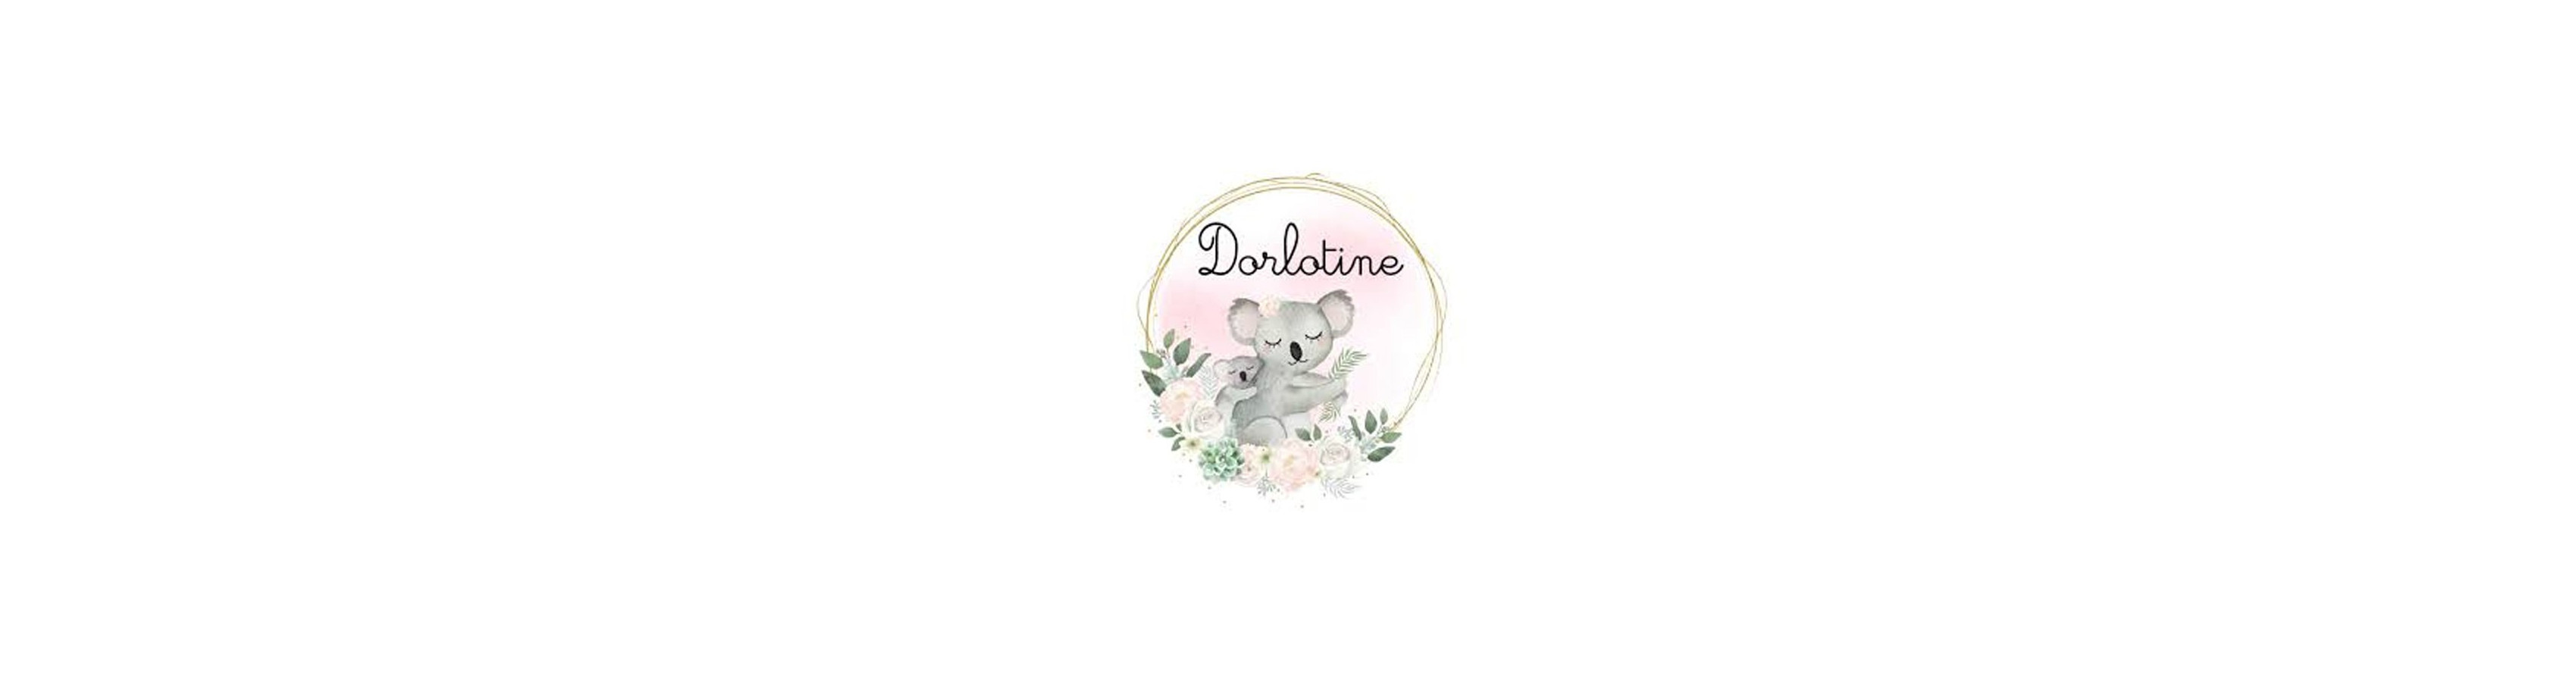 Dorlotine - Birth Box